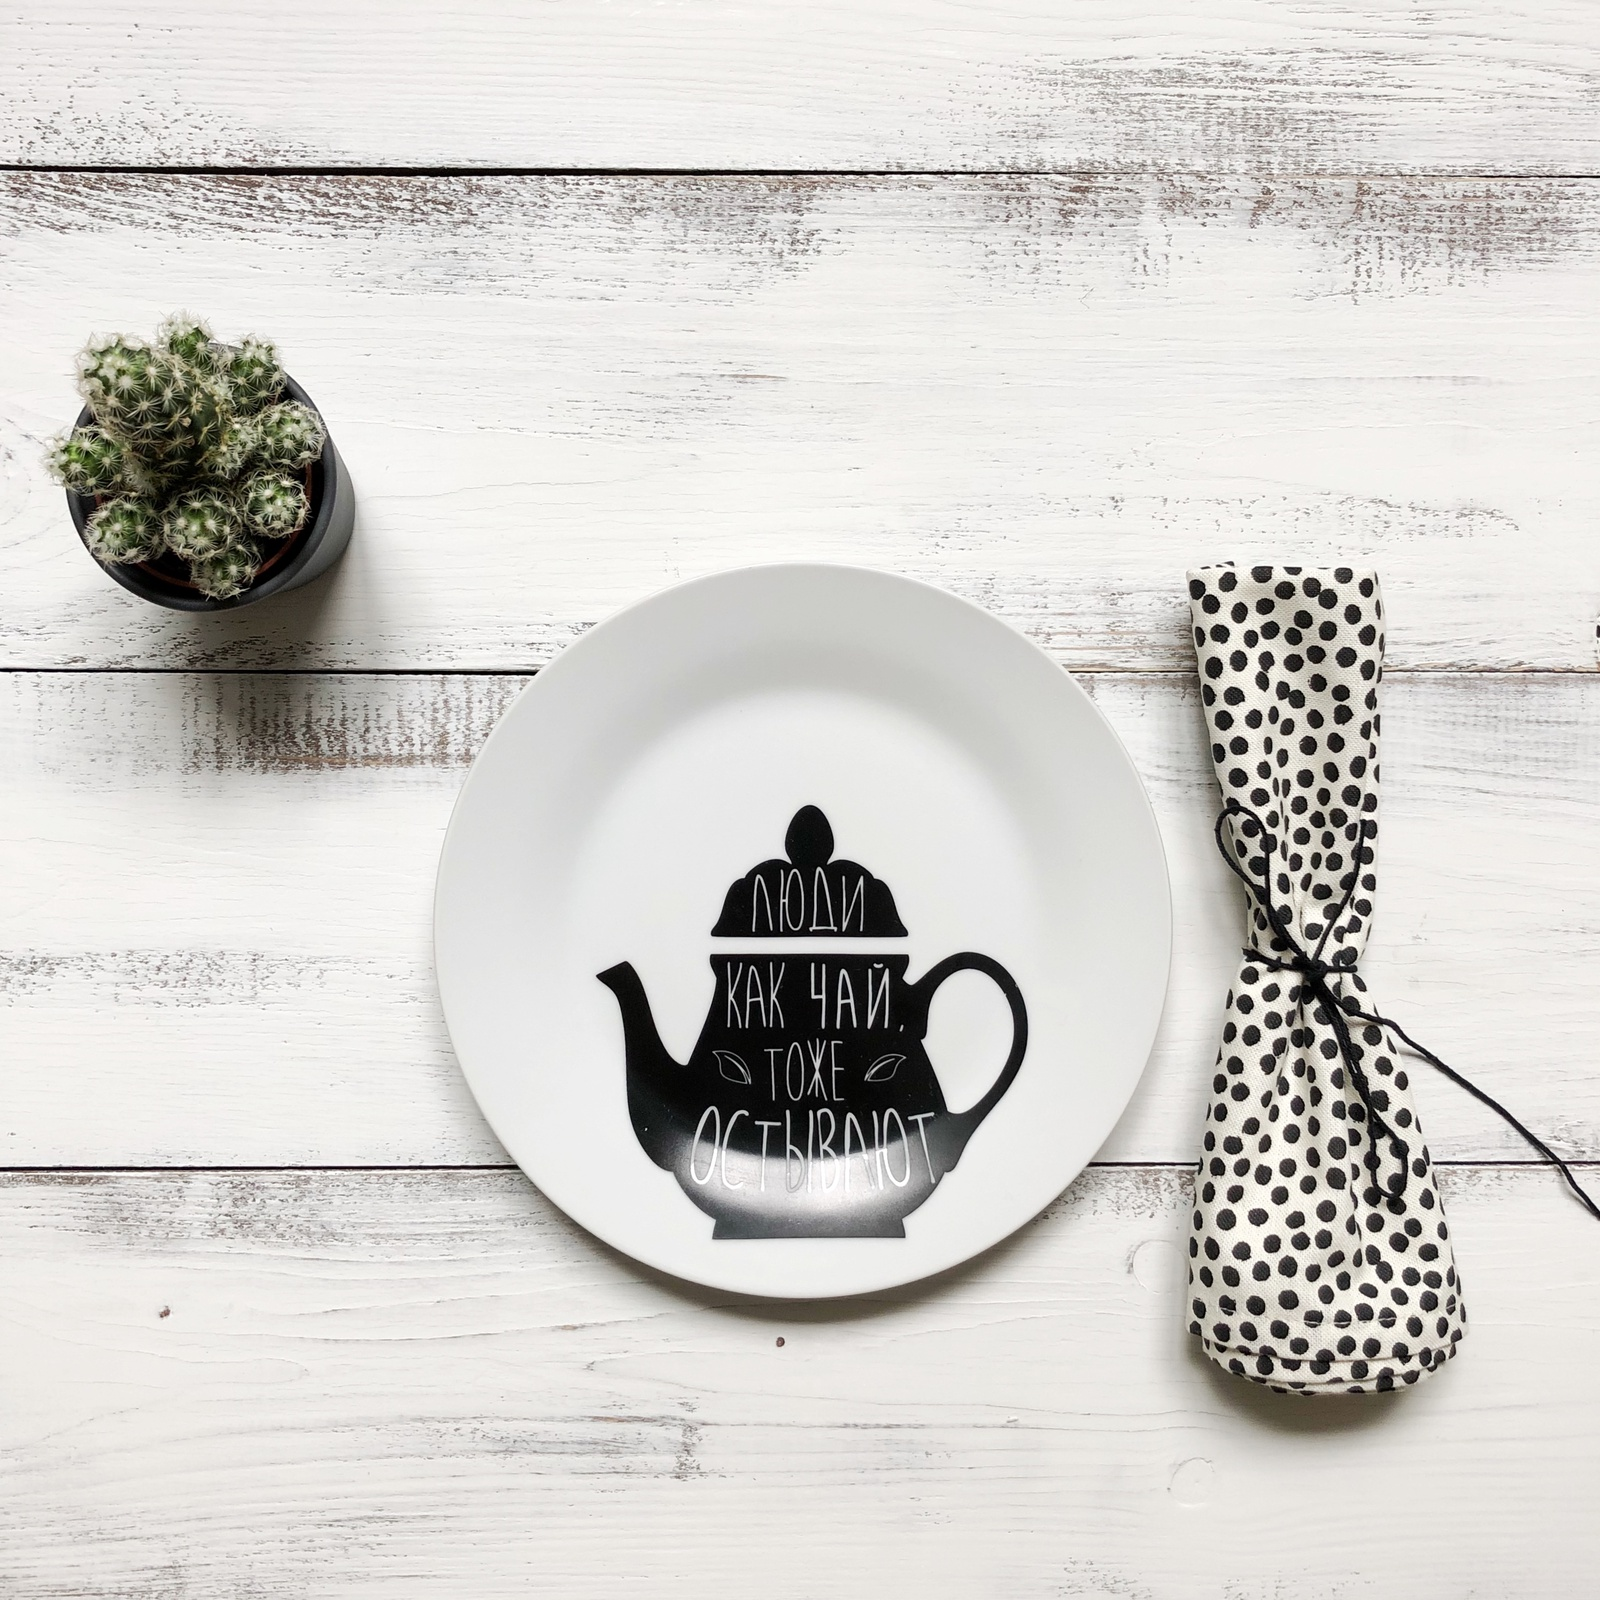 Тарелка Сотвори Чудо Люди как чай 20 см, белый тарелка мелкая сотвори чудо воздушный город диаметр 20 см